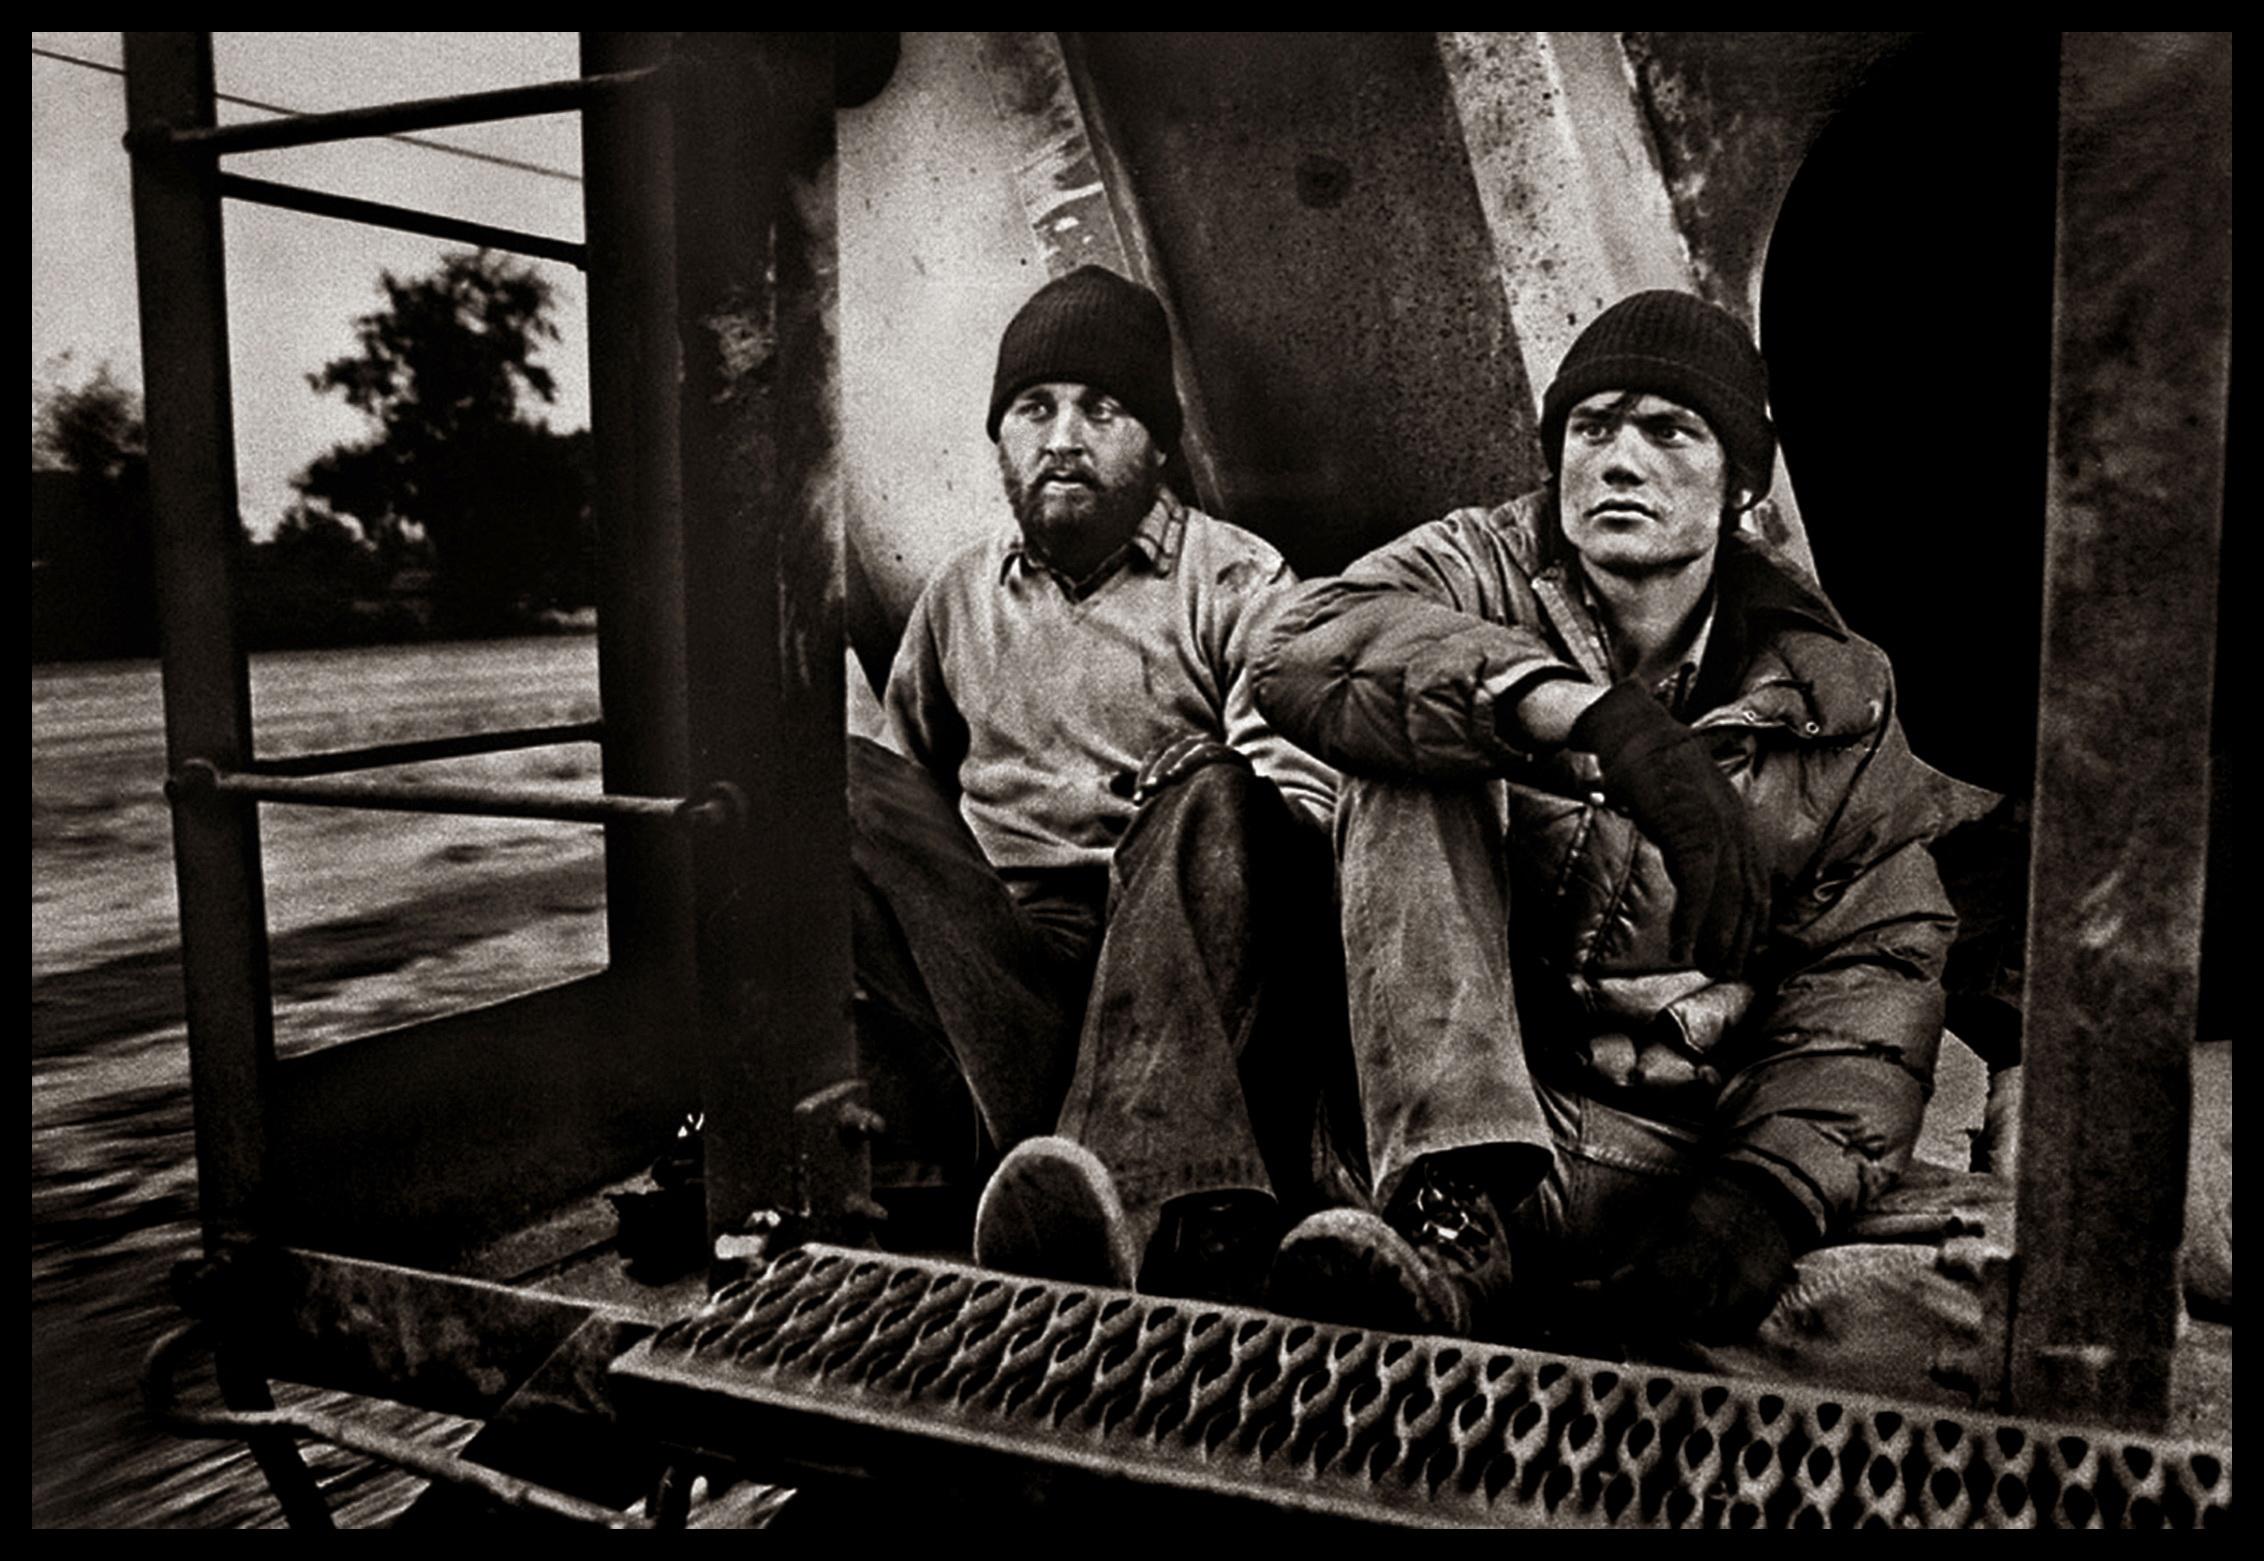 Photographer Michael S. Williamson (L) and writer Dale Maharidge ride the rails near Fresno, California in March 1982. © Michael S. Williamson